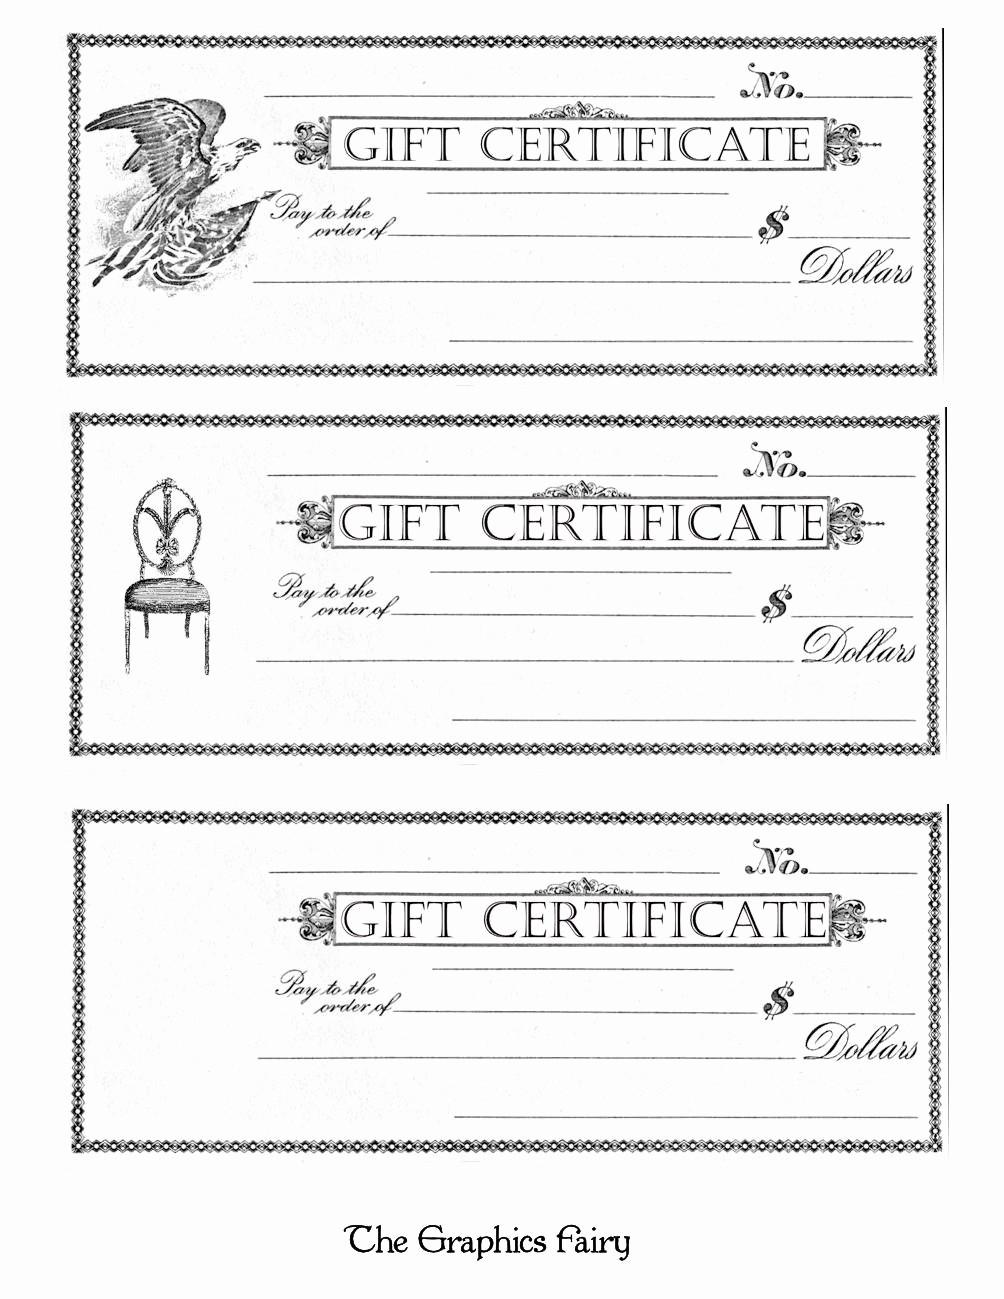 Print Gift Certificates Free Templates Elegant Free Printable Gift Certificates the Graphics Fairy